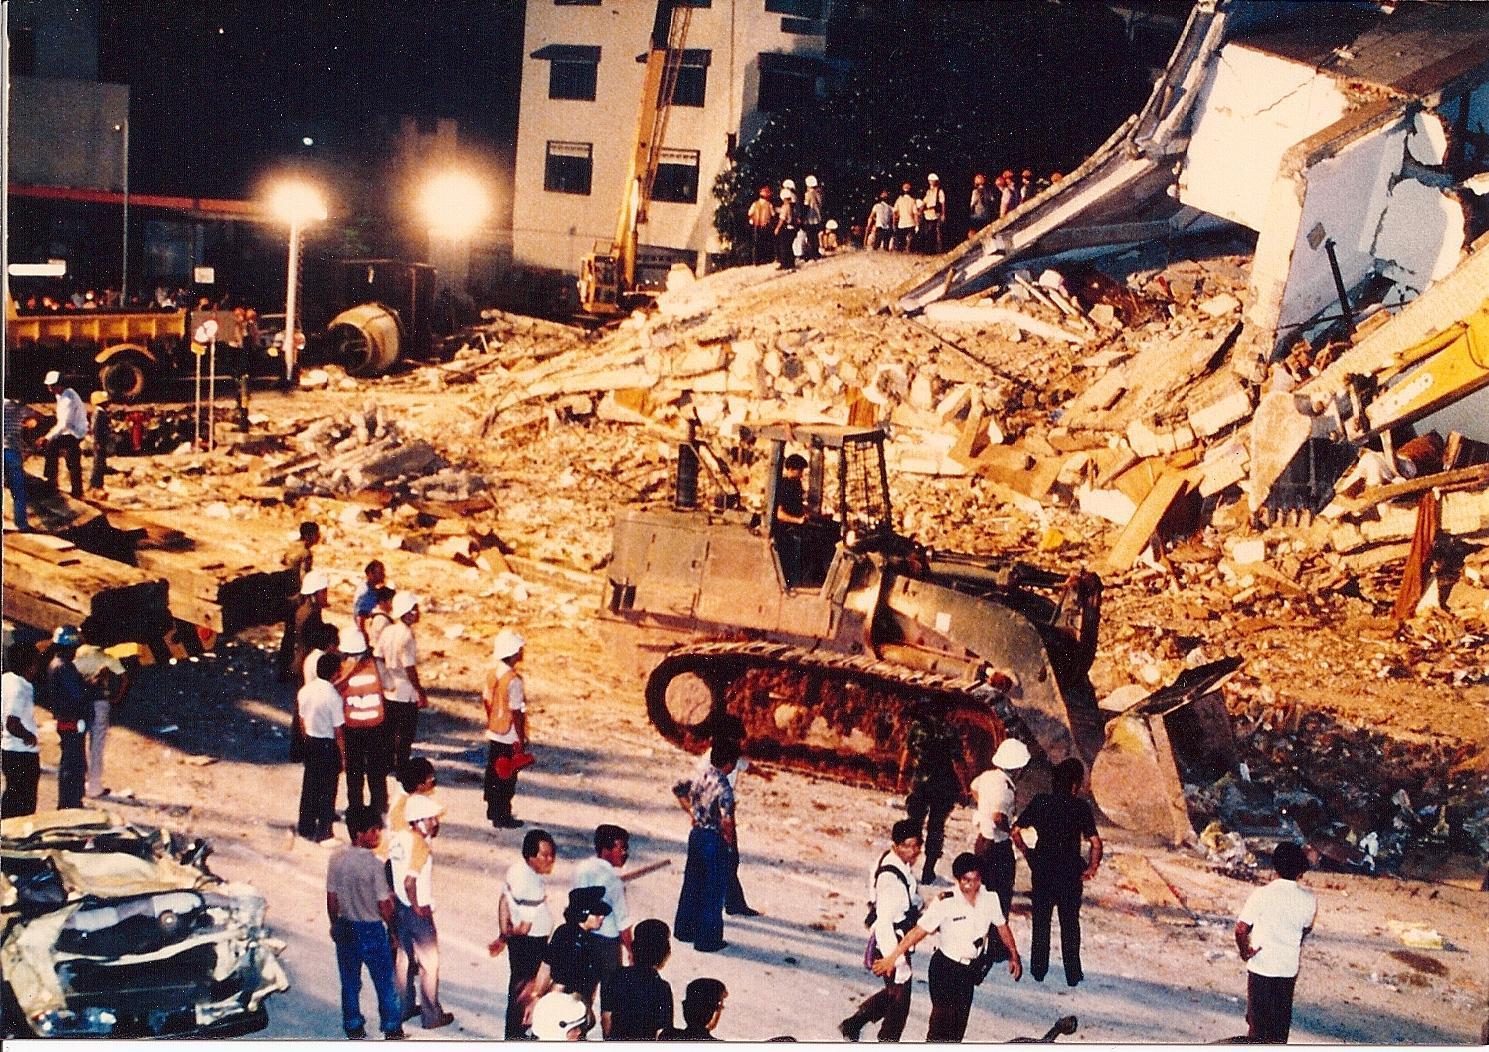 5 desastres enormes causados por idiotas